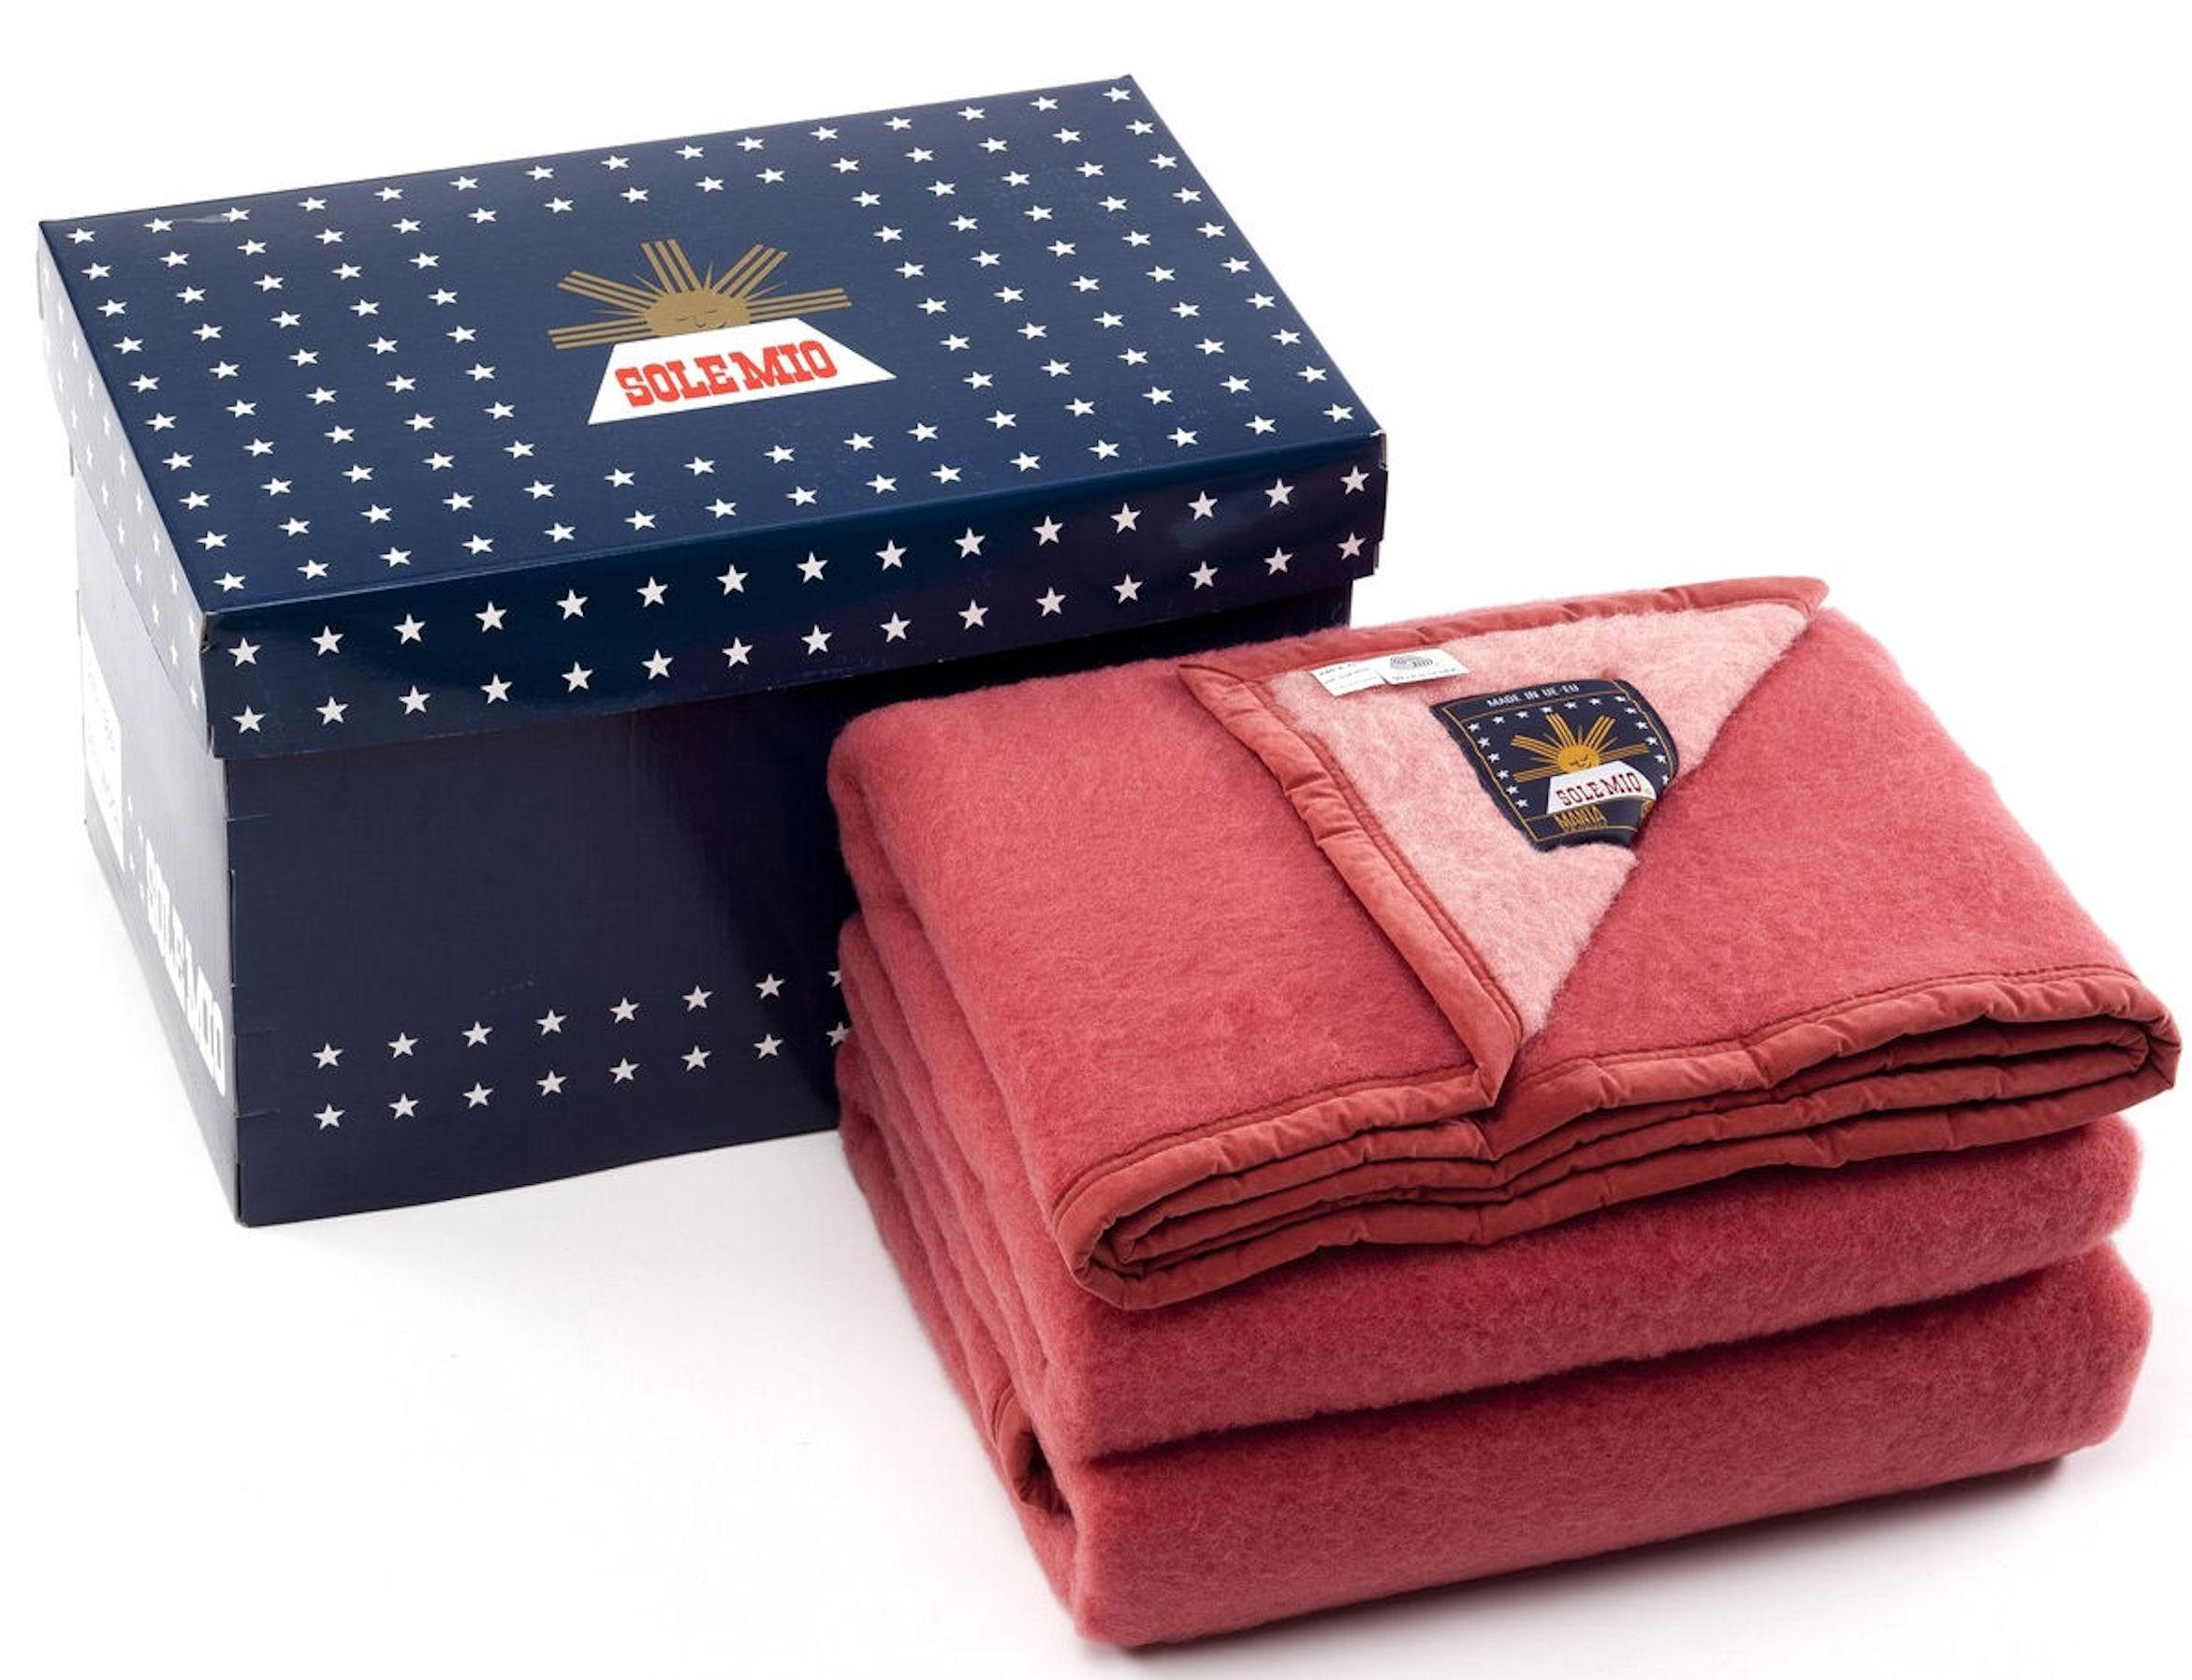 Sole Mio scheerwollen deken rood-aardbei